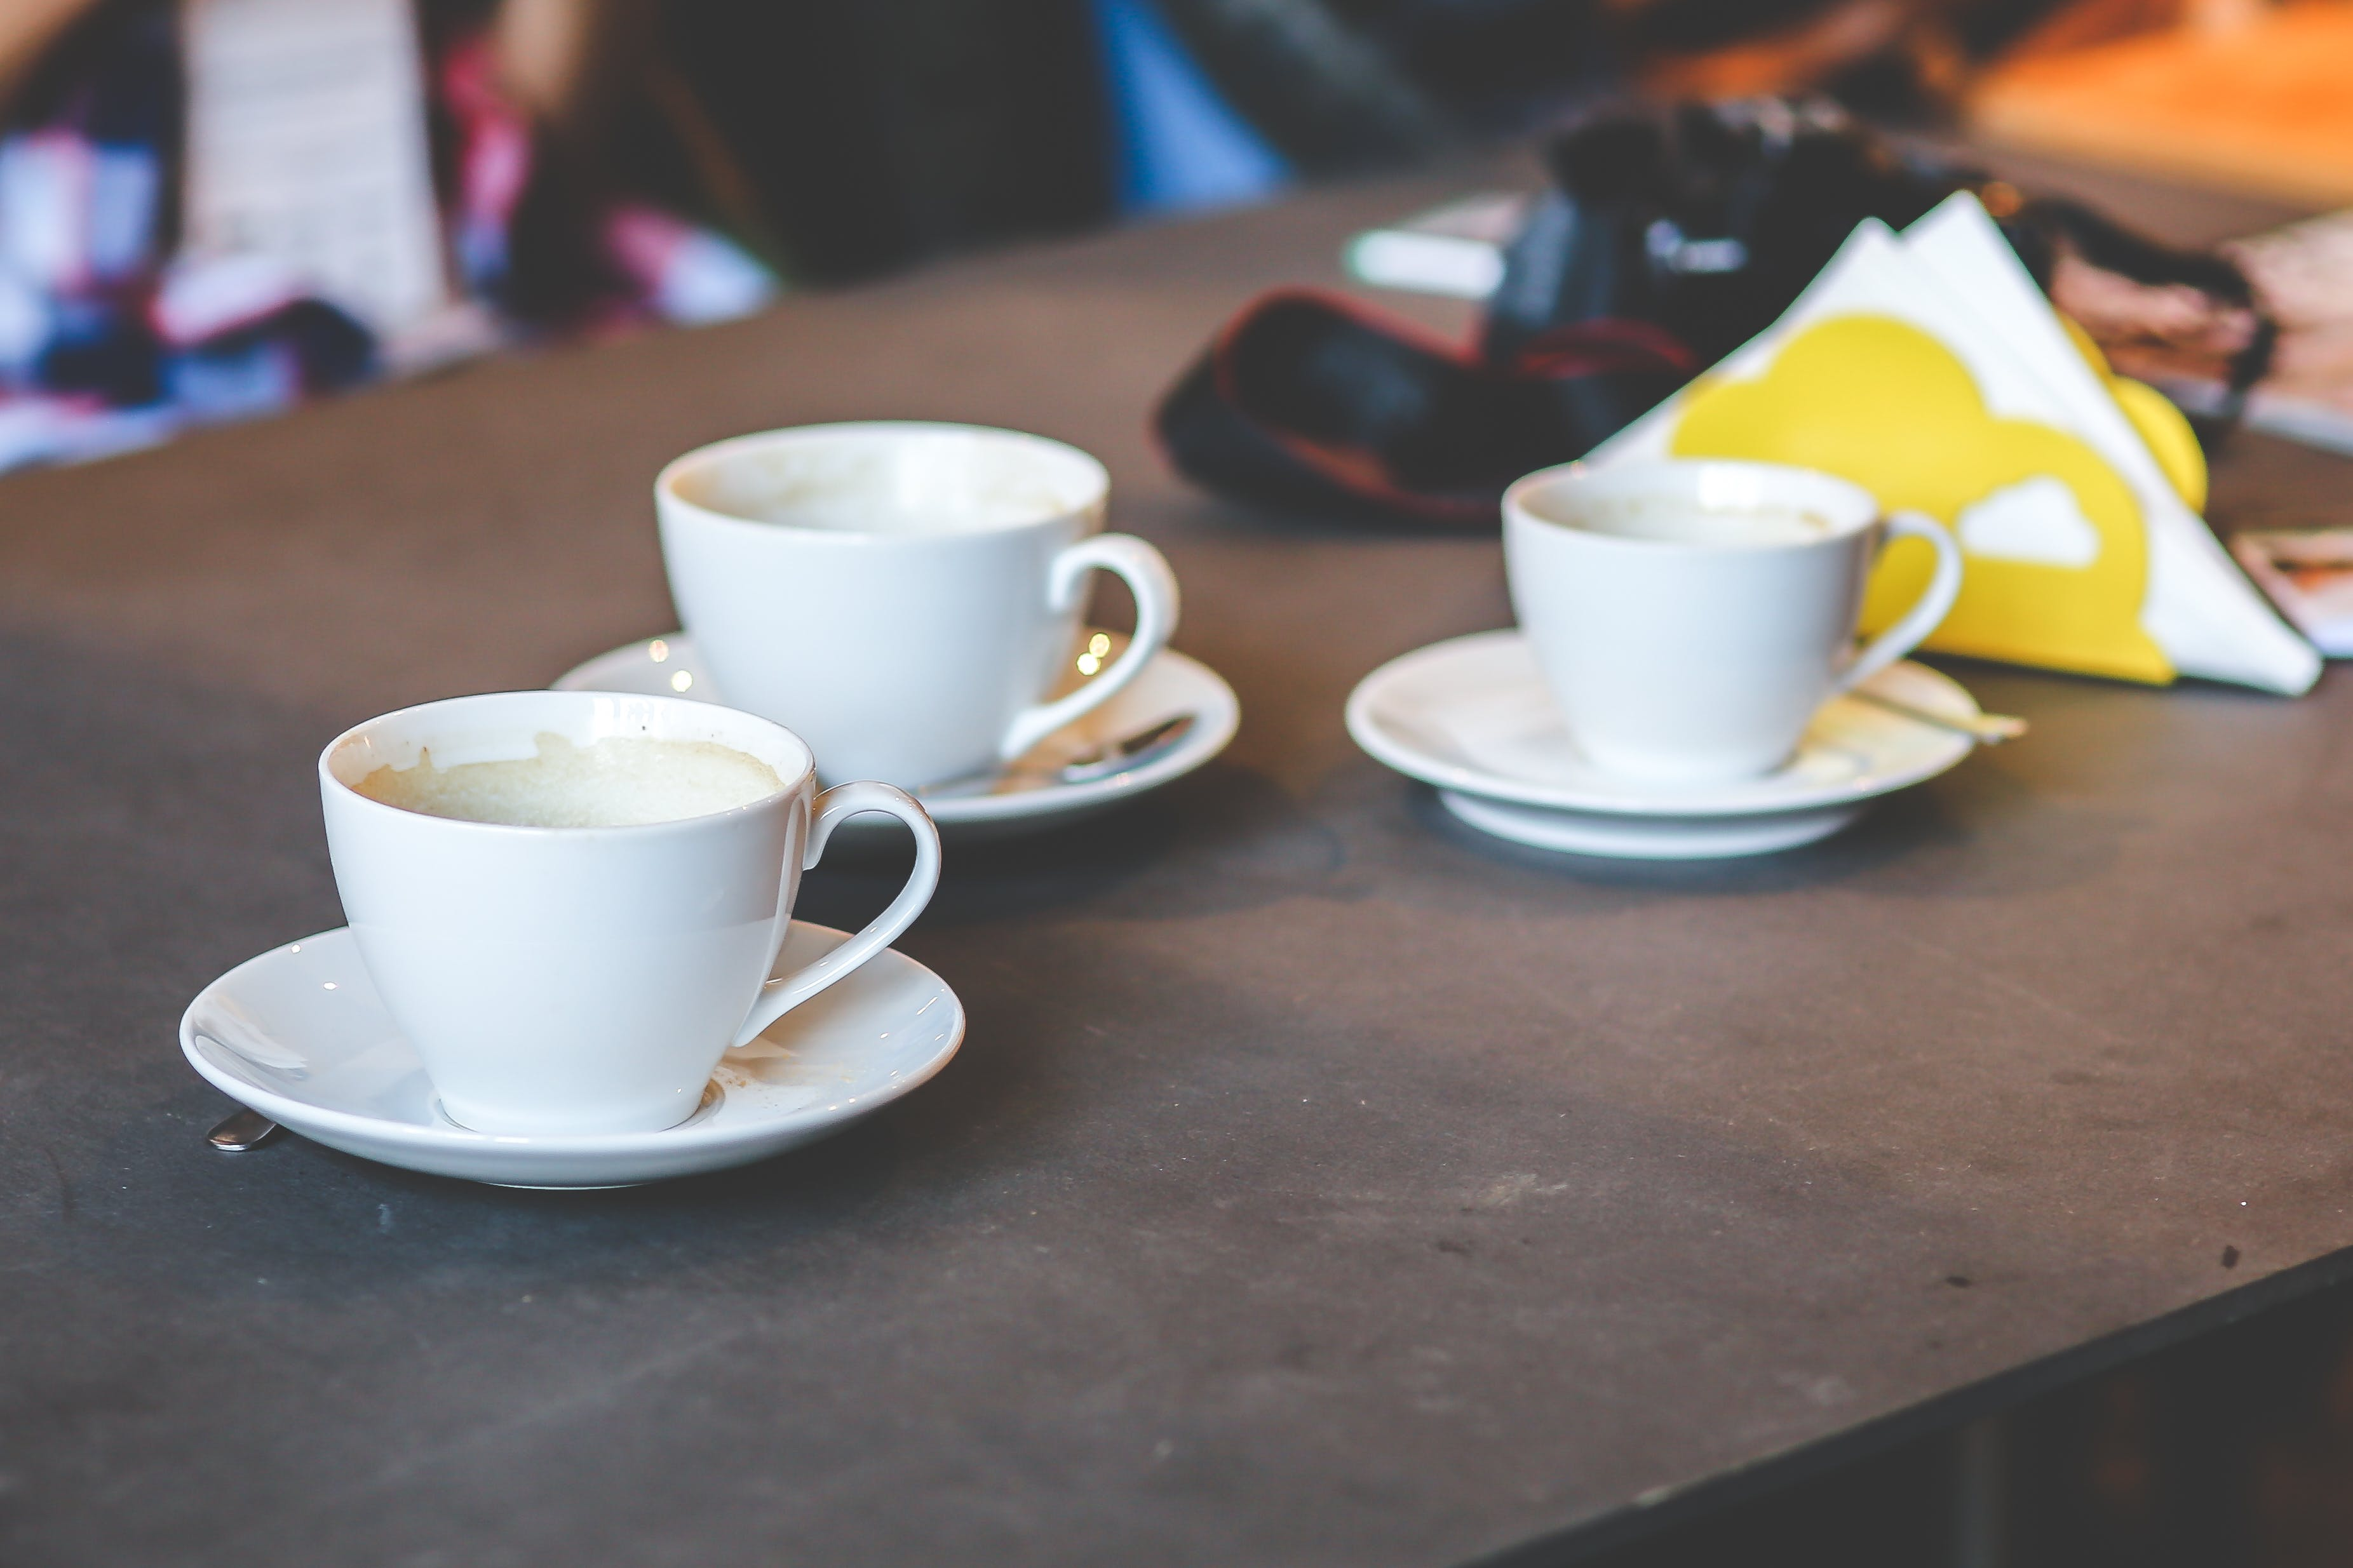 Three white cups